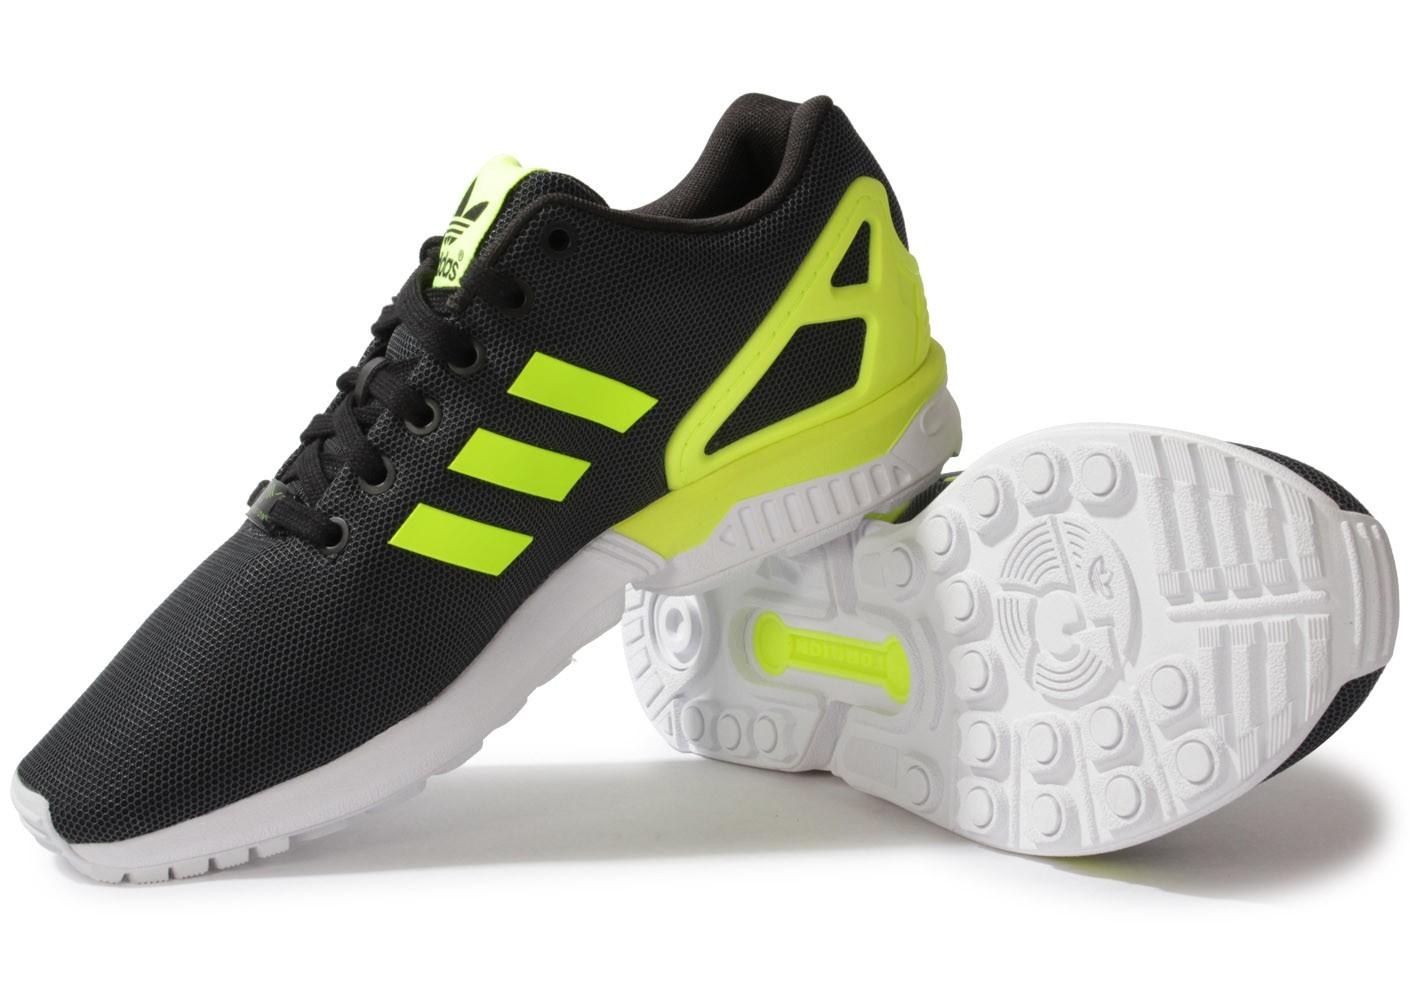 adidas zx flux jaune pas cher allow project.eu